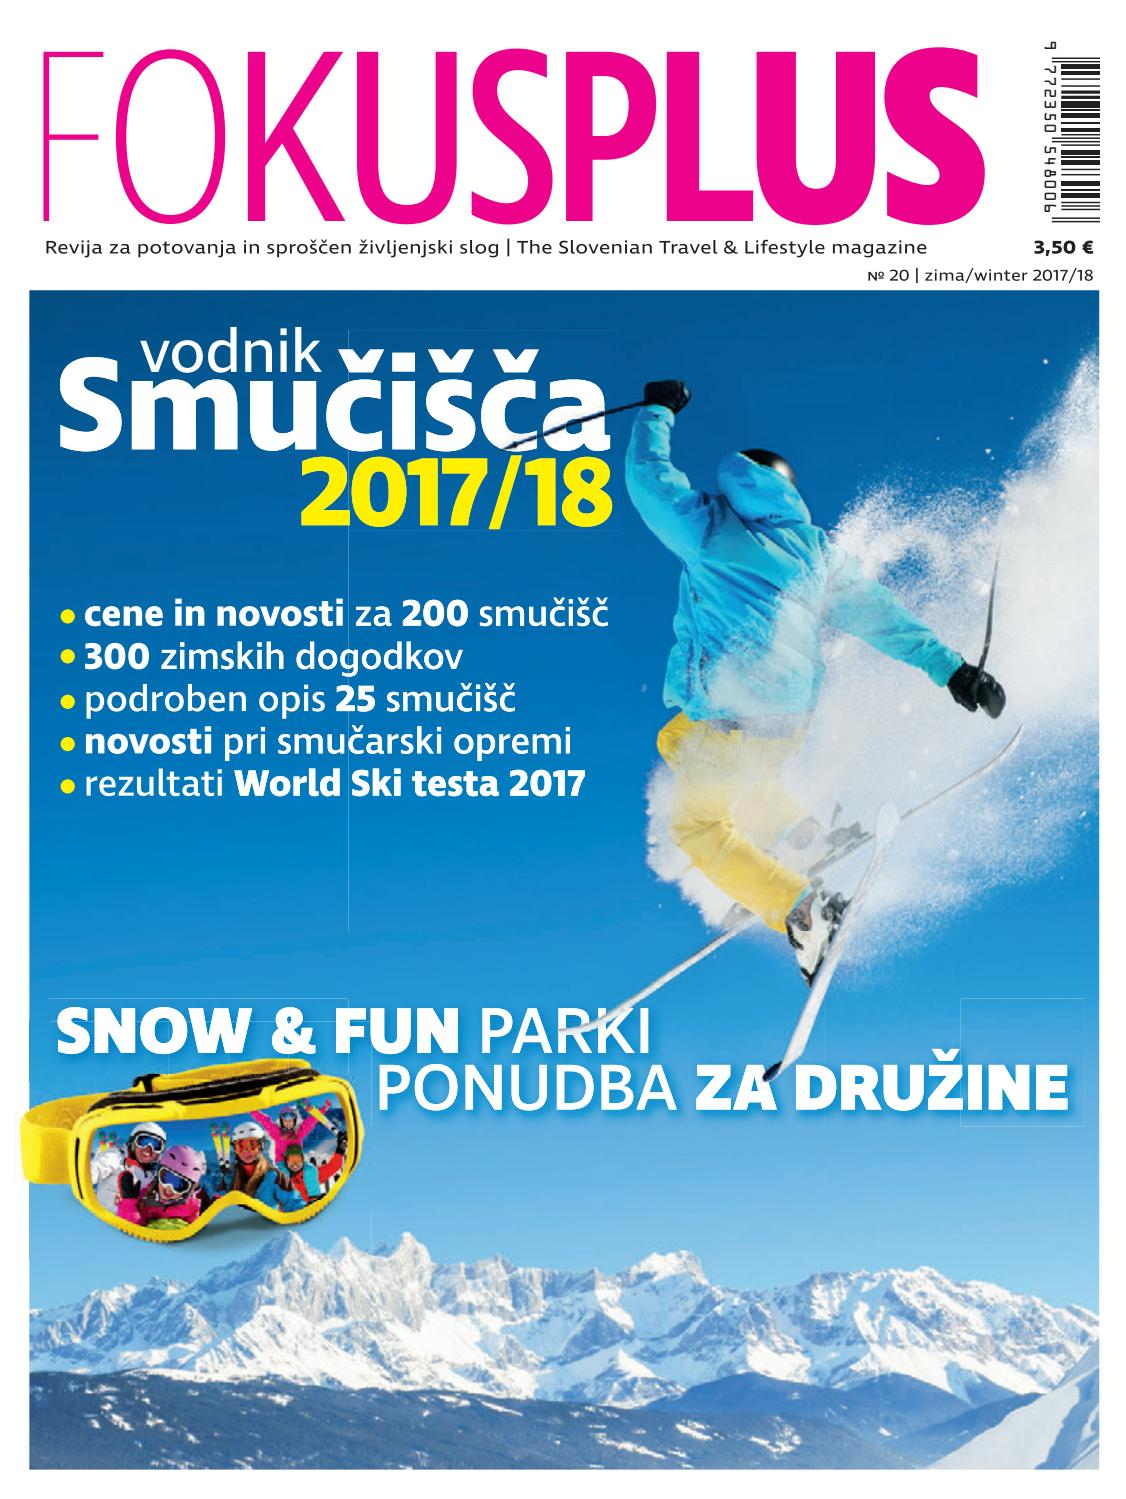 Fokusplus_20 Winter Ski Guide_2017